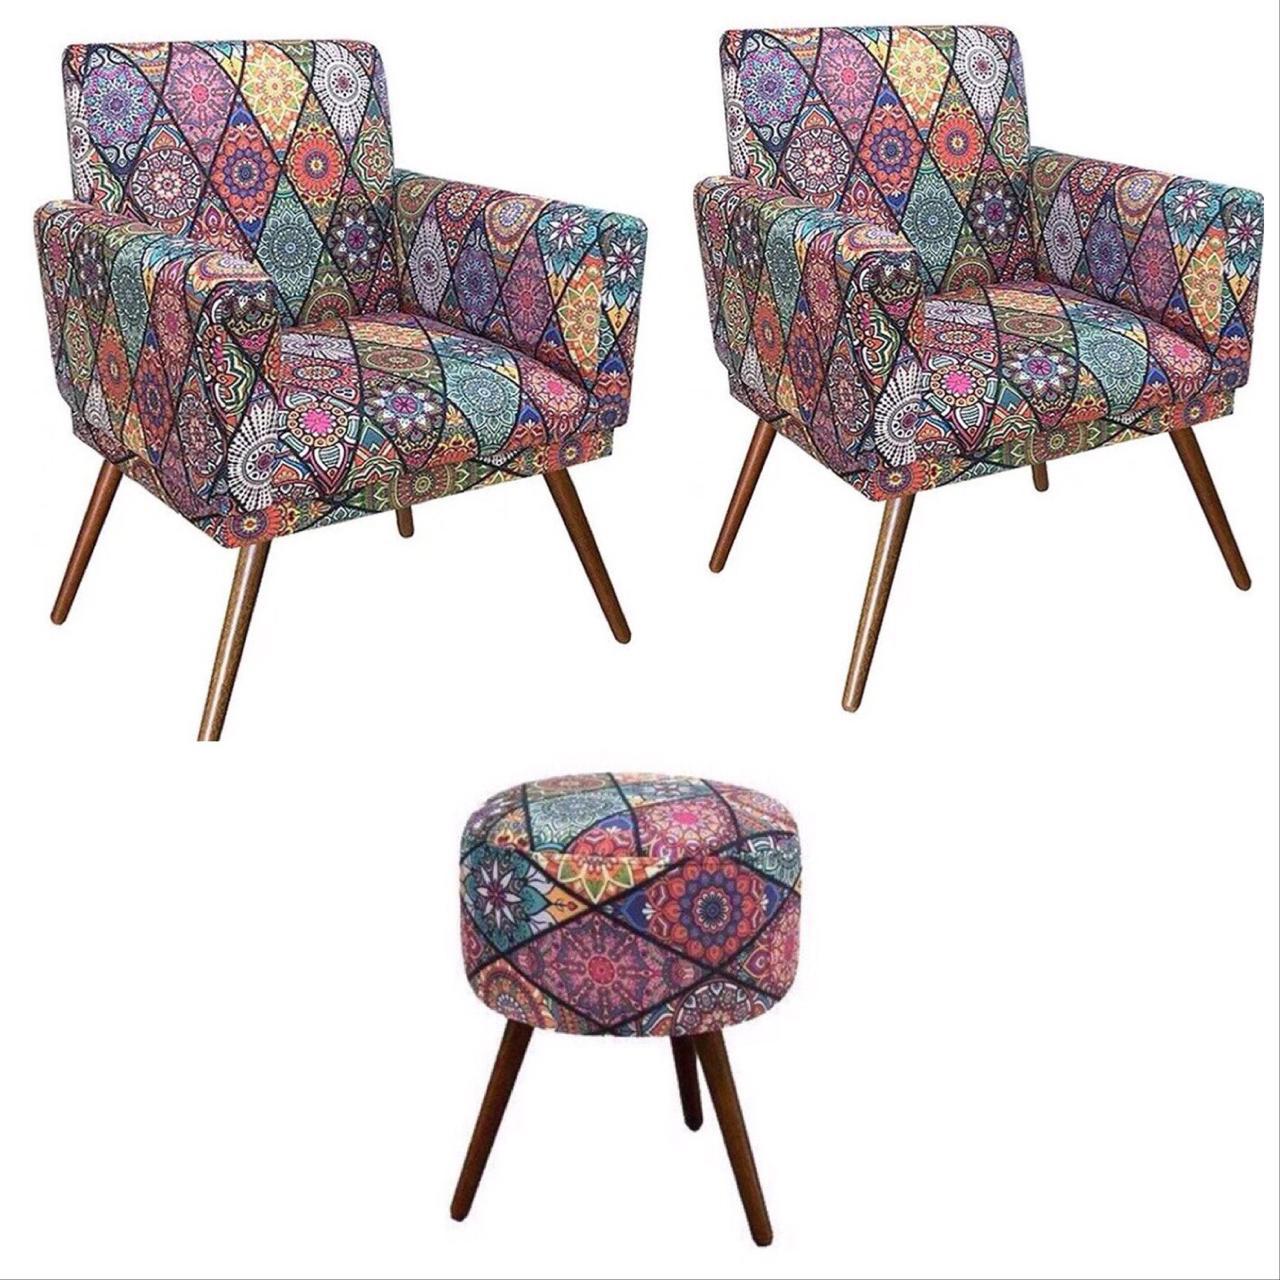 Kit 02 Poltronas Decorativa Nina com rodapé e Puff redondo Mosaico - Bela Casa Shop